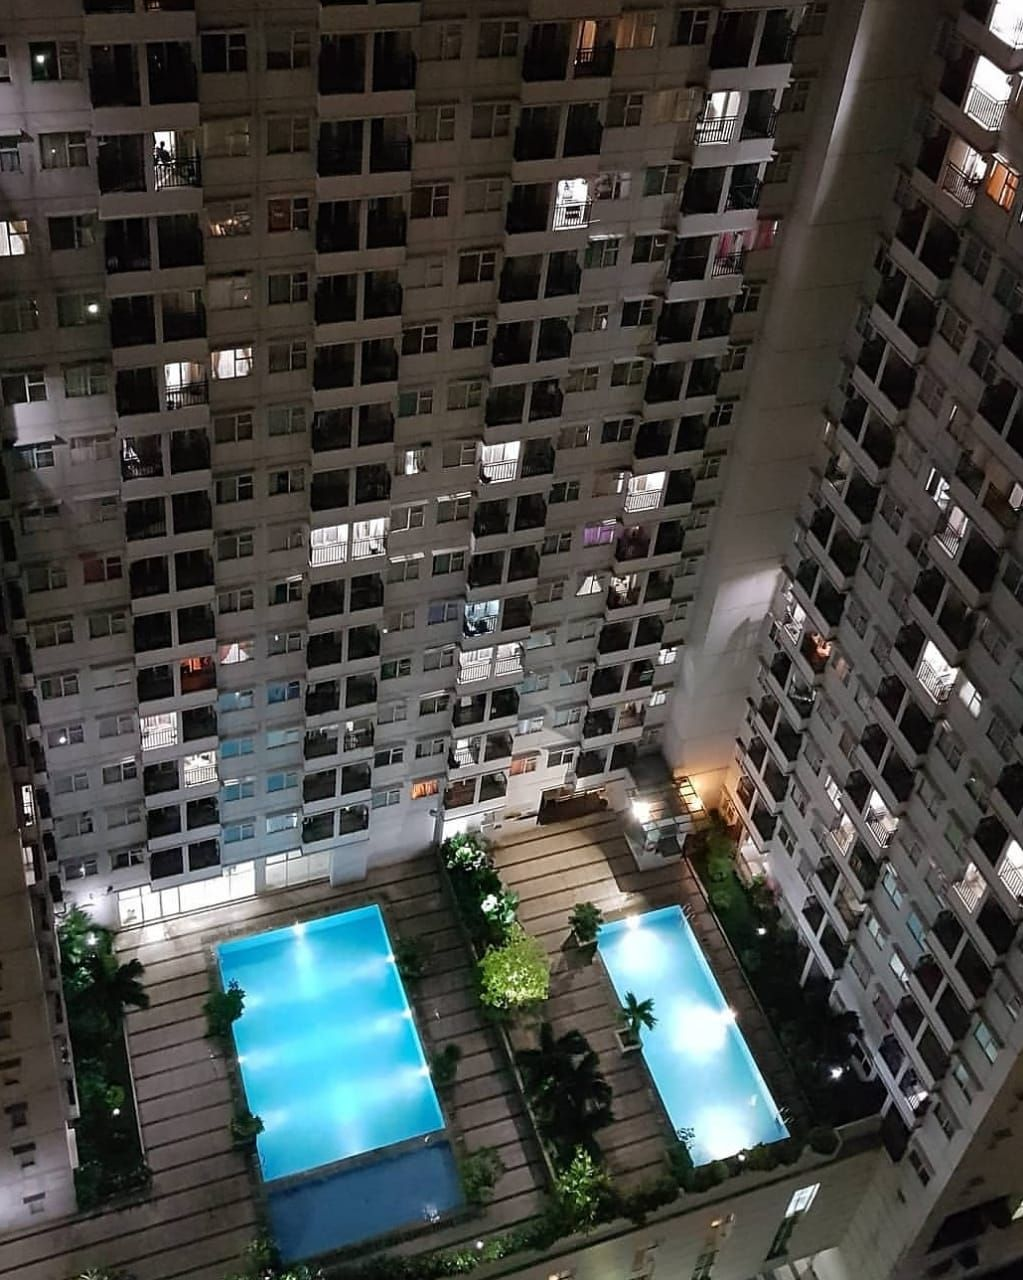 D n C Apartment Margonda Residence IV & V, Depok